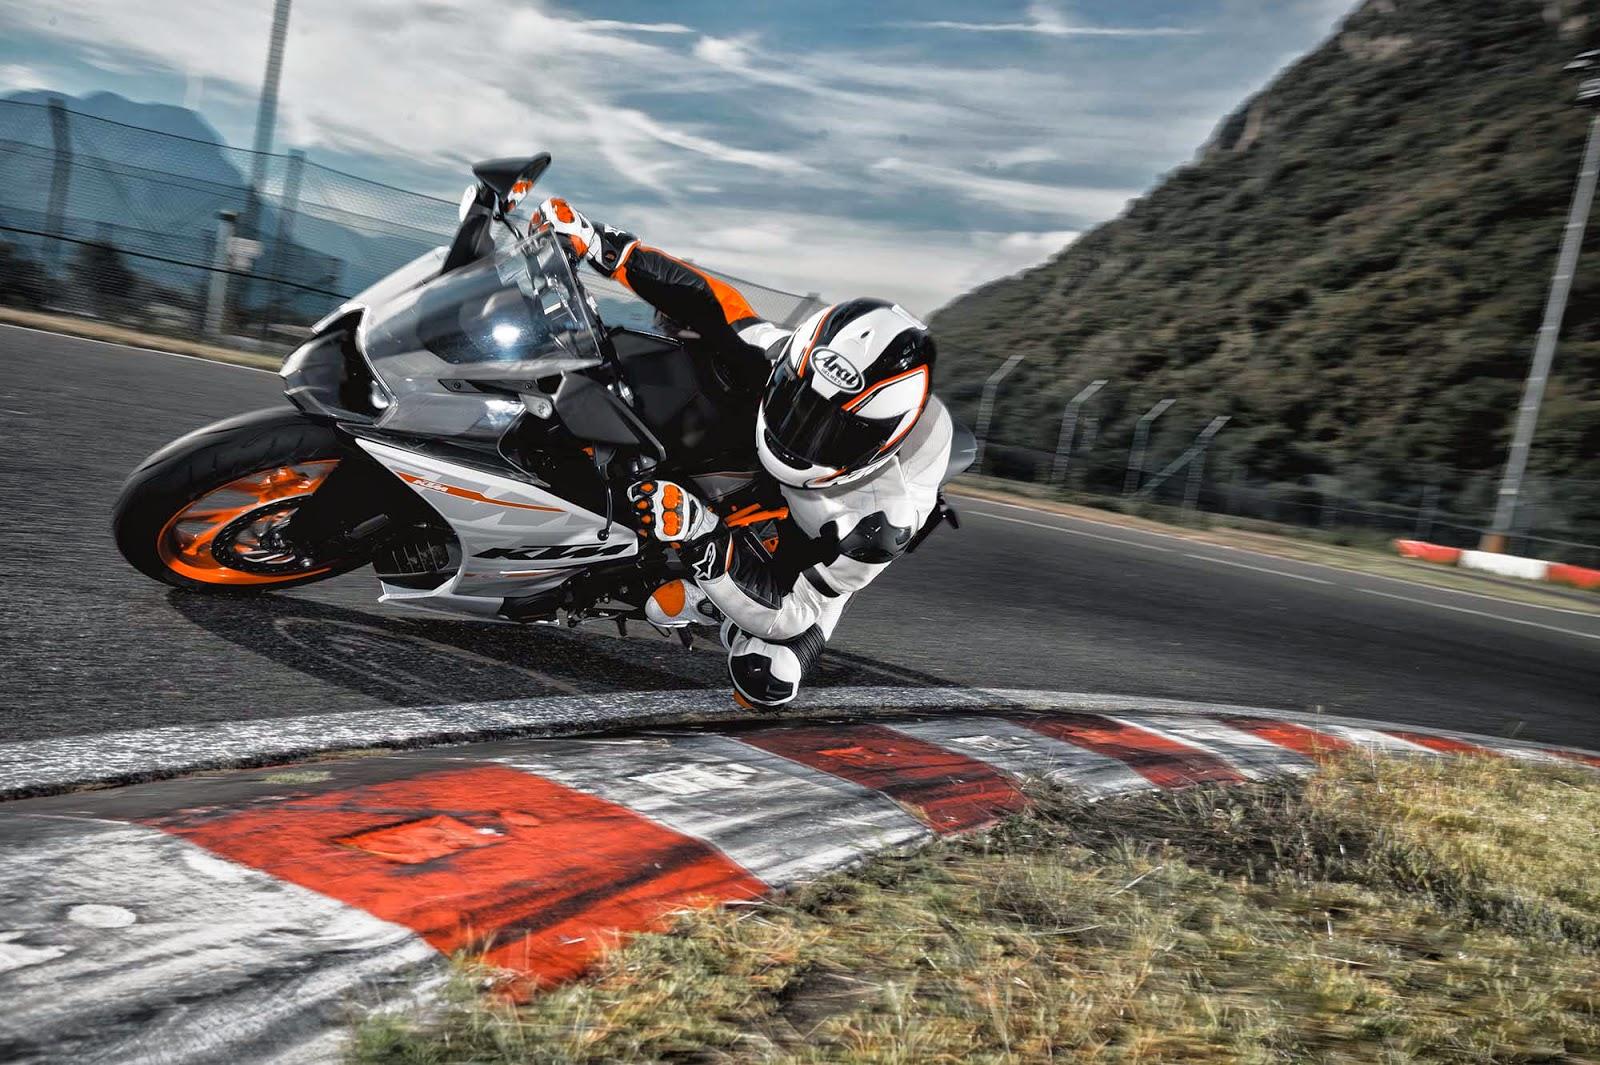 KTM 1190 RC8 R white Bikes Hd Wallppaers for Desktop